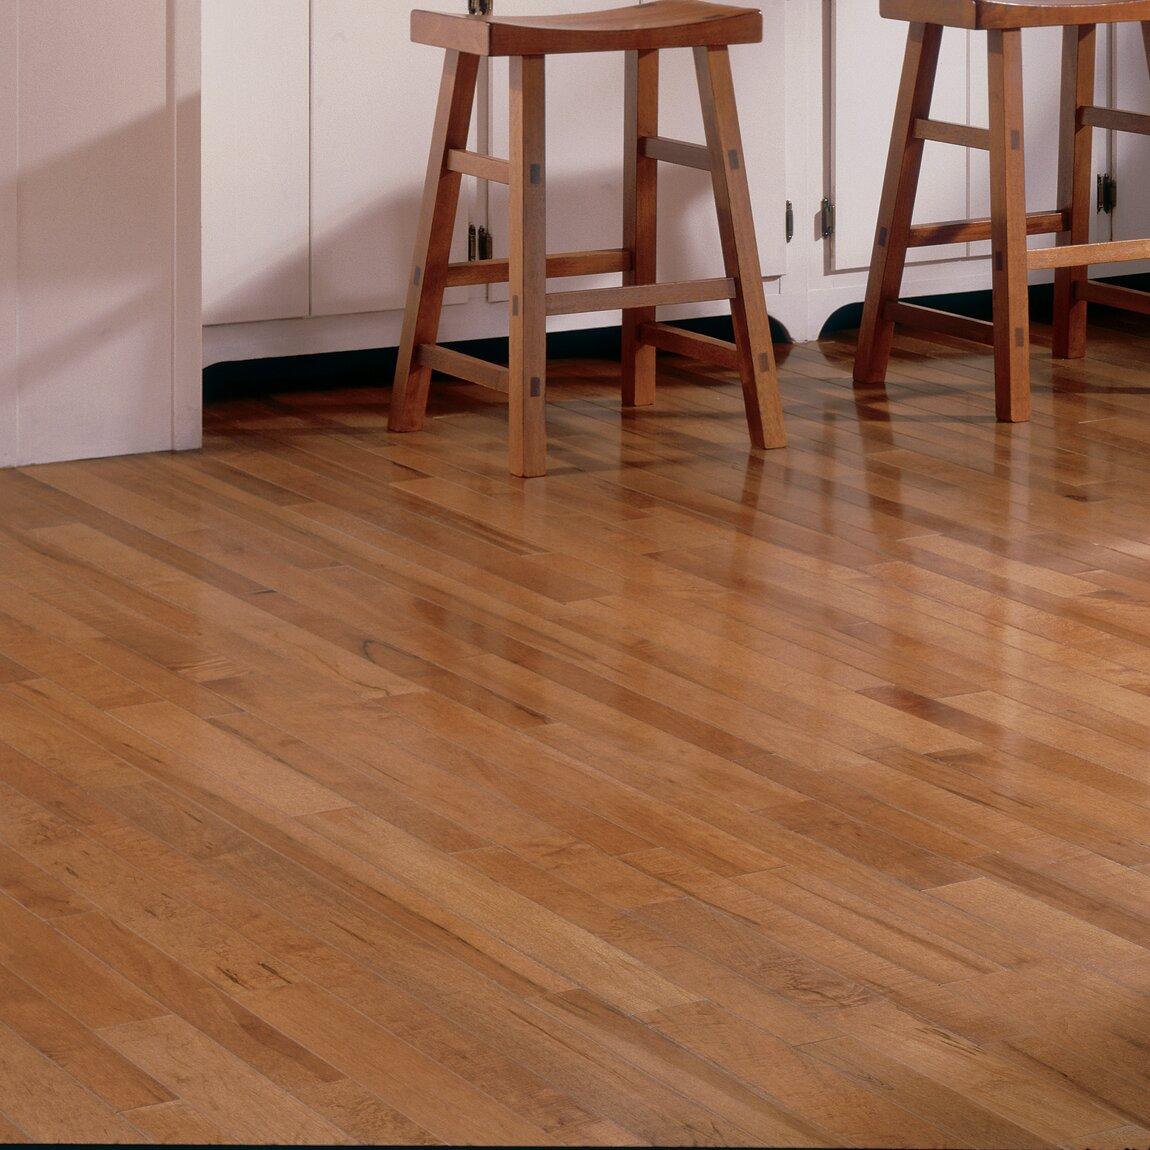 Somerset 3 1 4 solid maple strip hardwood flooring in for Somerset flooring